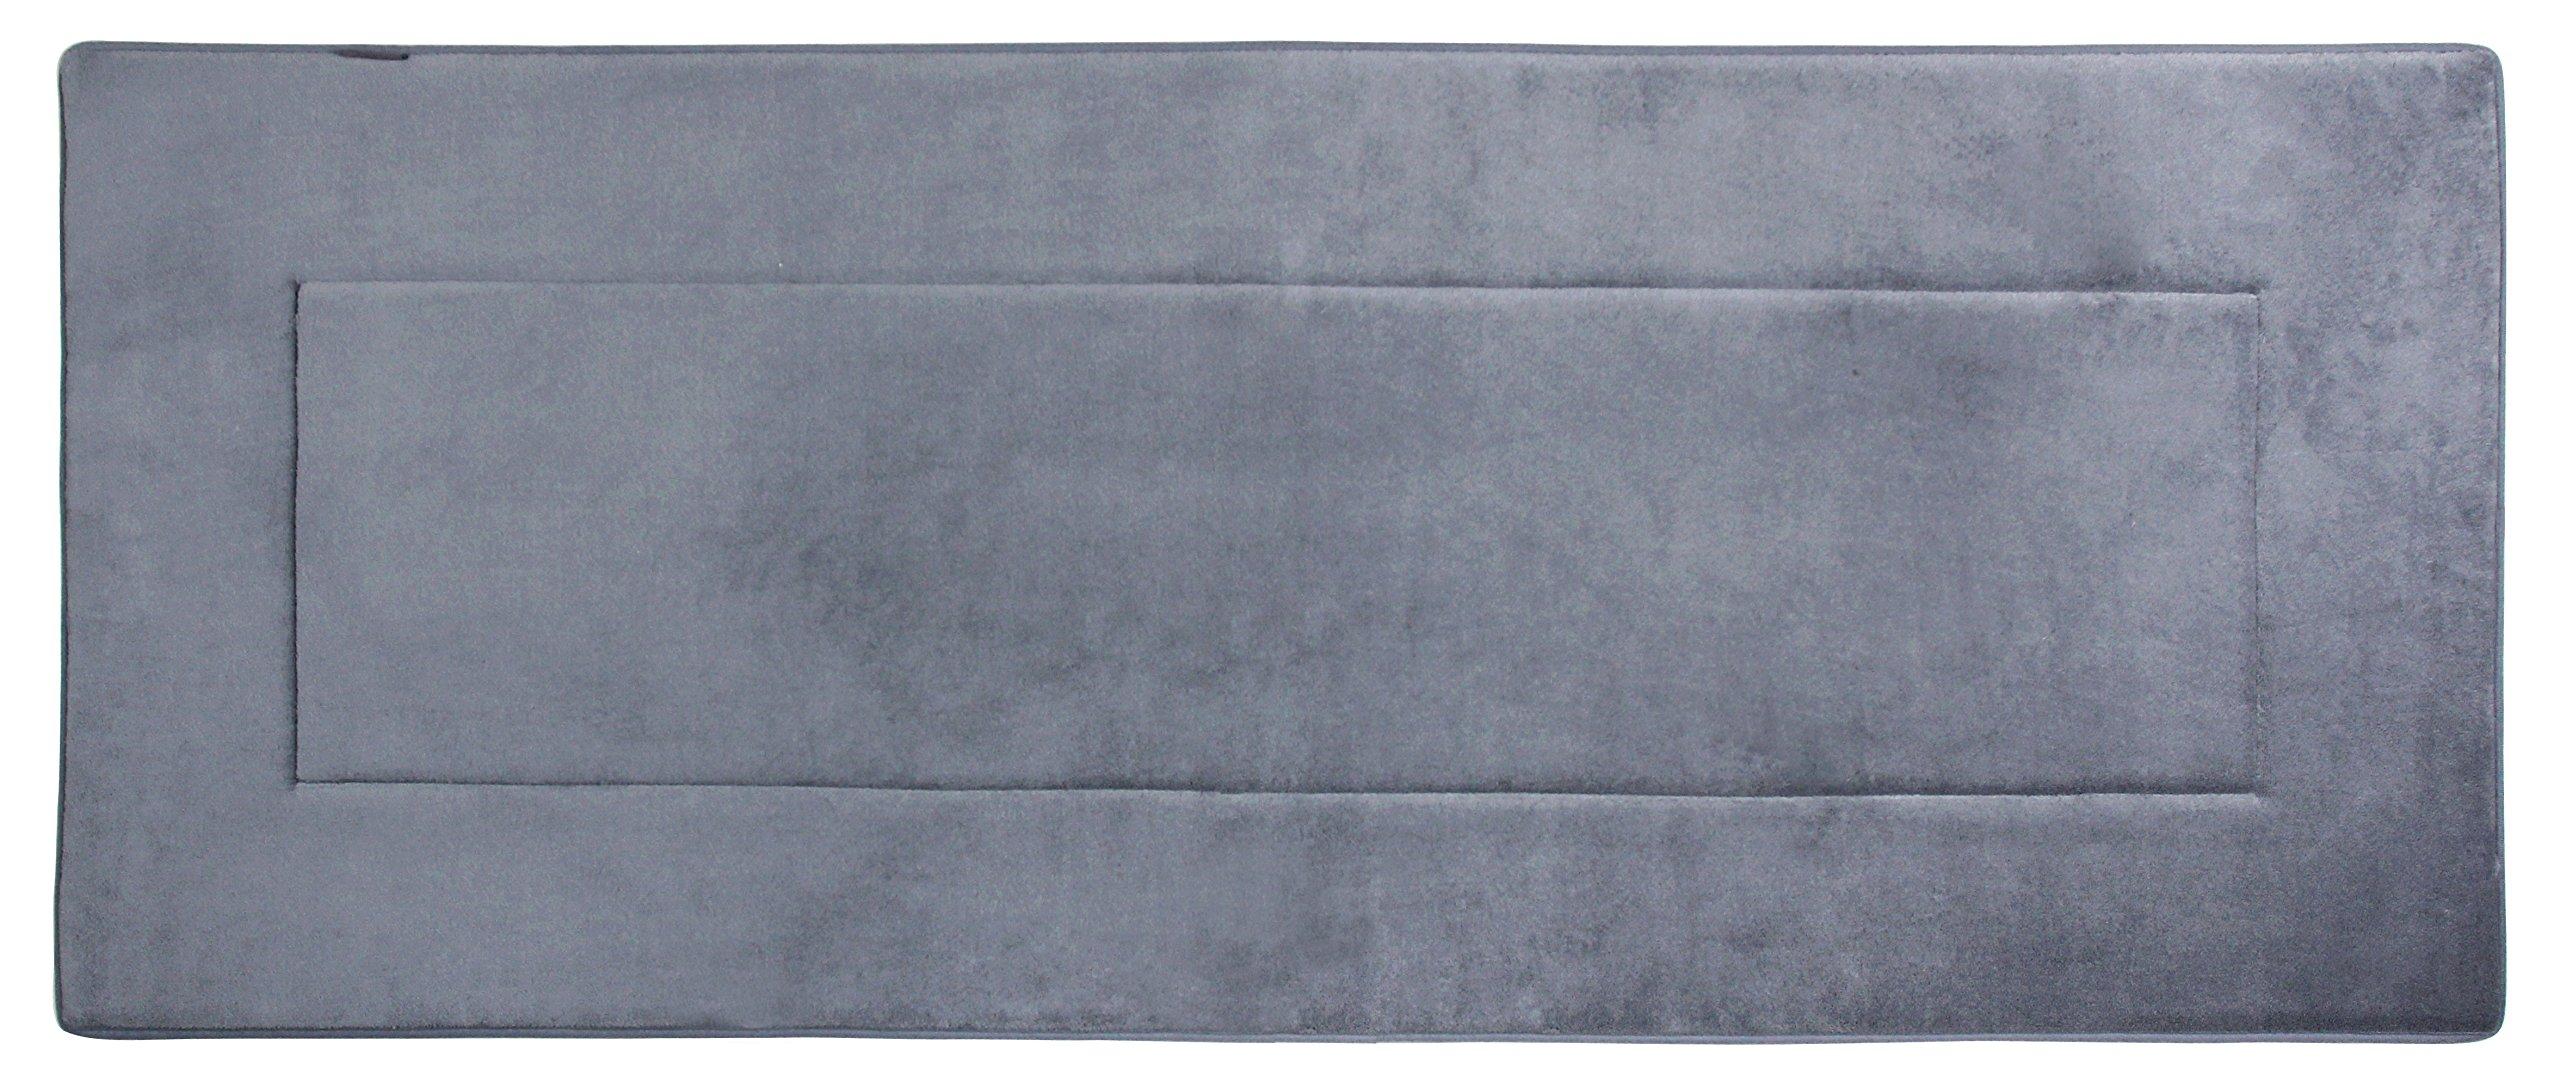 Fabbrica Home Ultra-Soft HD Memory Foam Runner (2 feet by 5 feet) (Slate Gray)